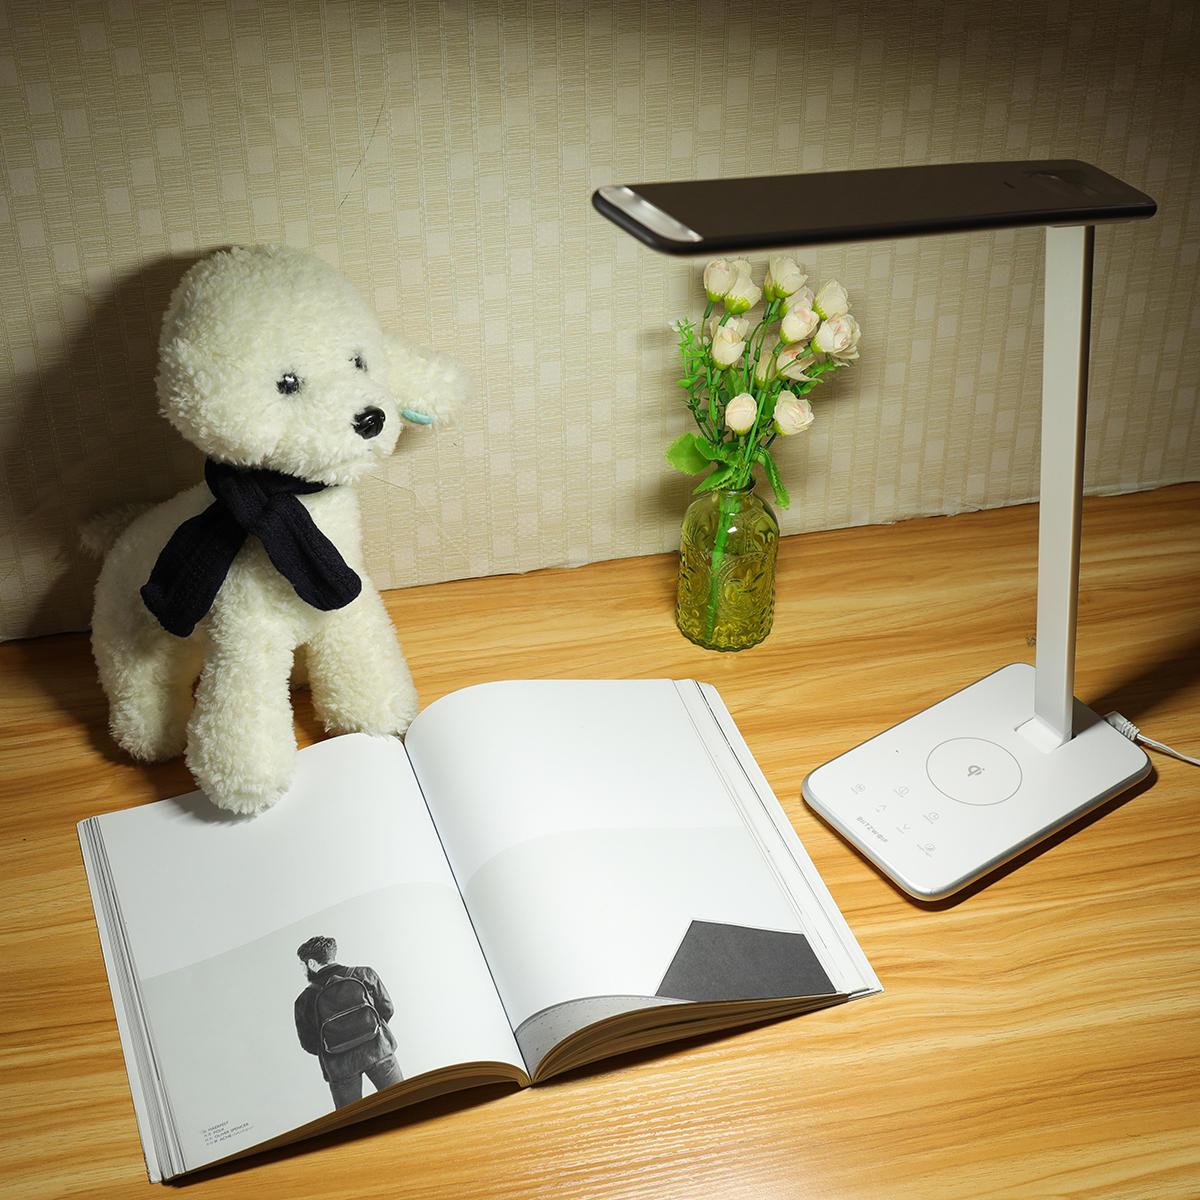 BlitzWolf® BW-LT7 Smart LED Desk Lamp with Qi Wireless Charger Five Brightness Modes Three Color Temperature Night-light Model EU plug white